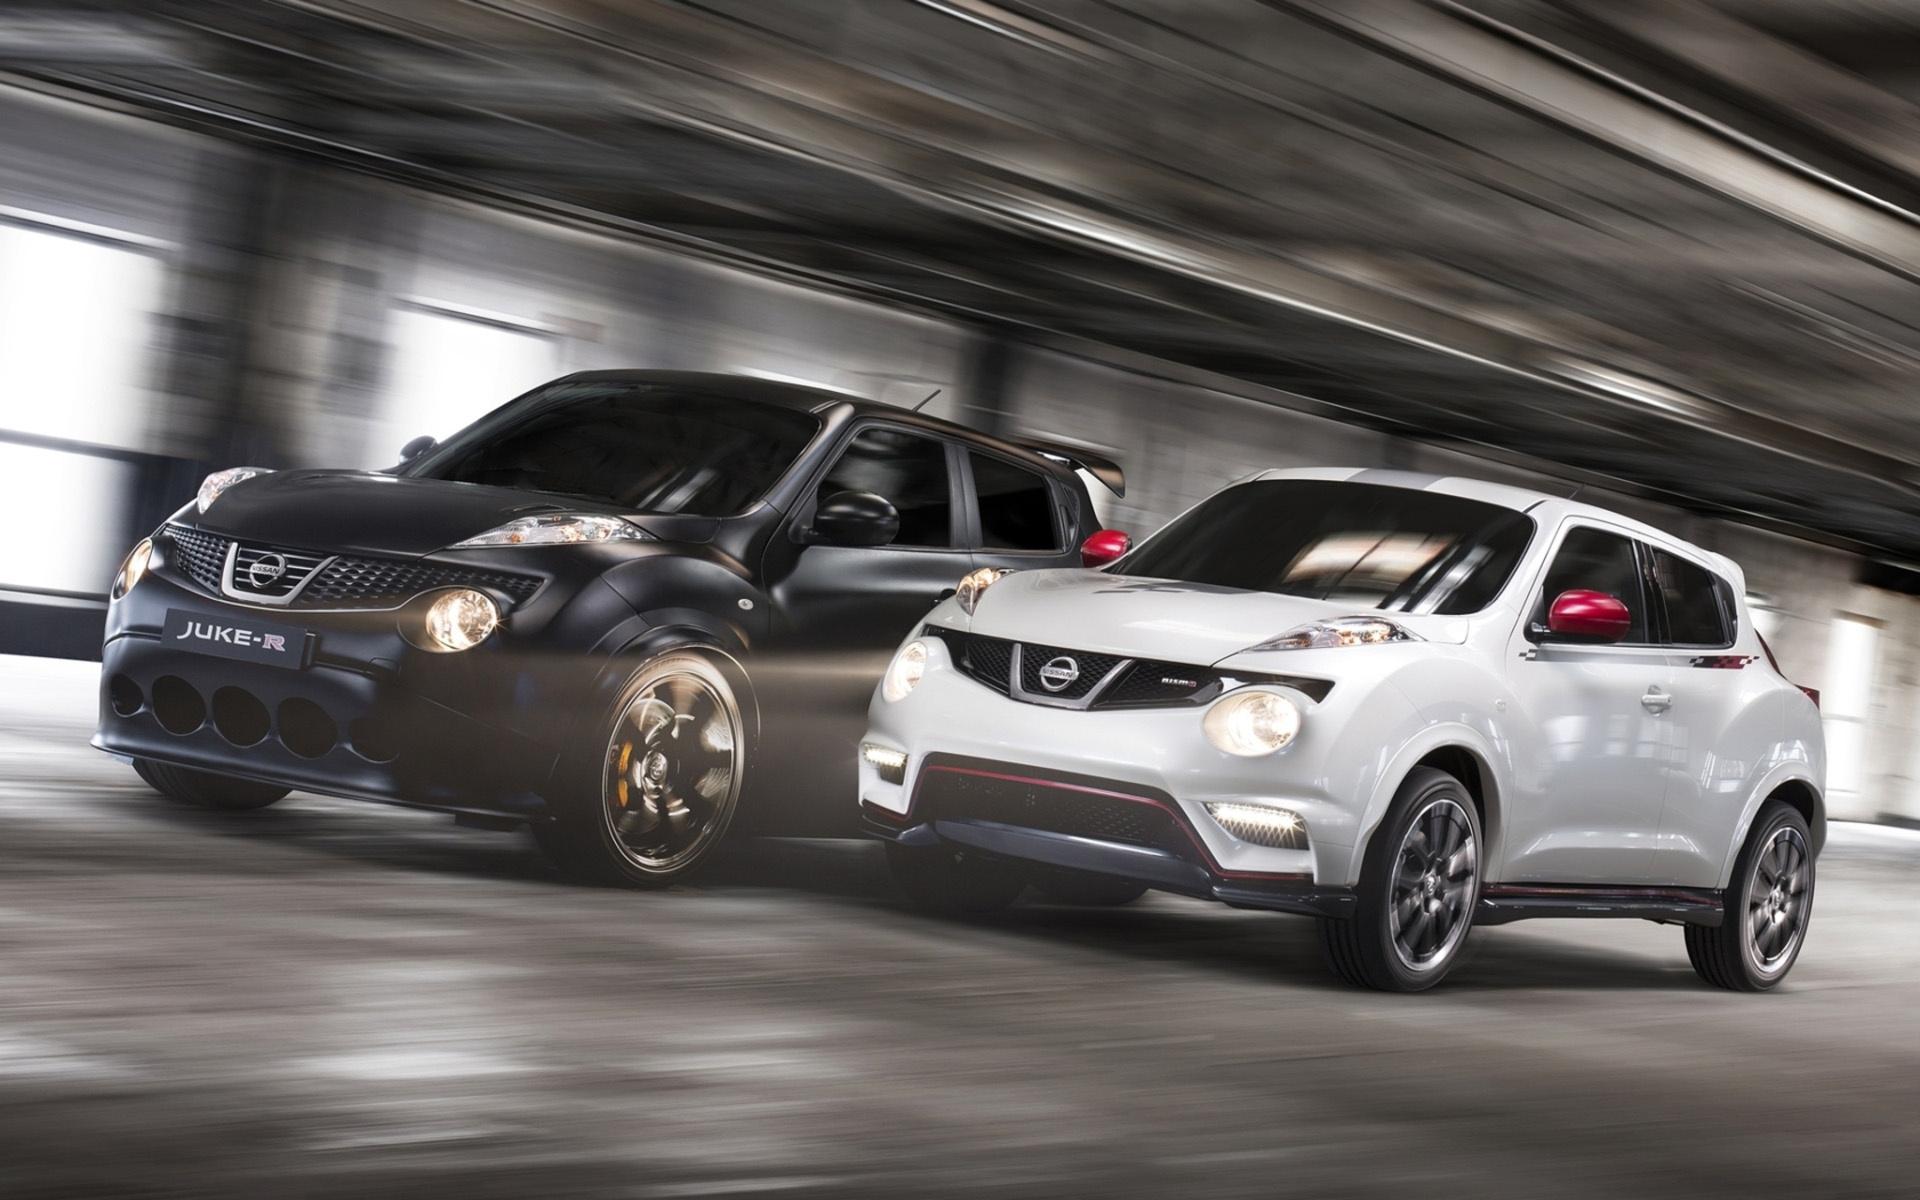 Nissan-Nismo-Nissan-Juke-R